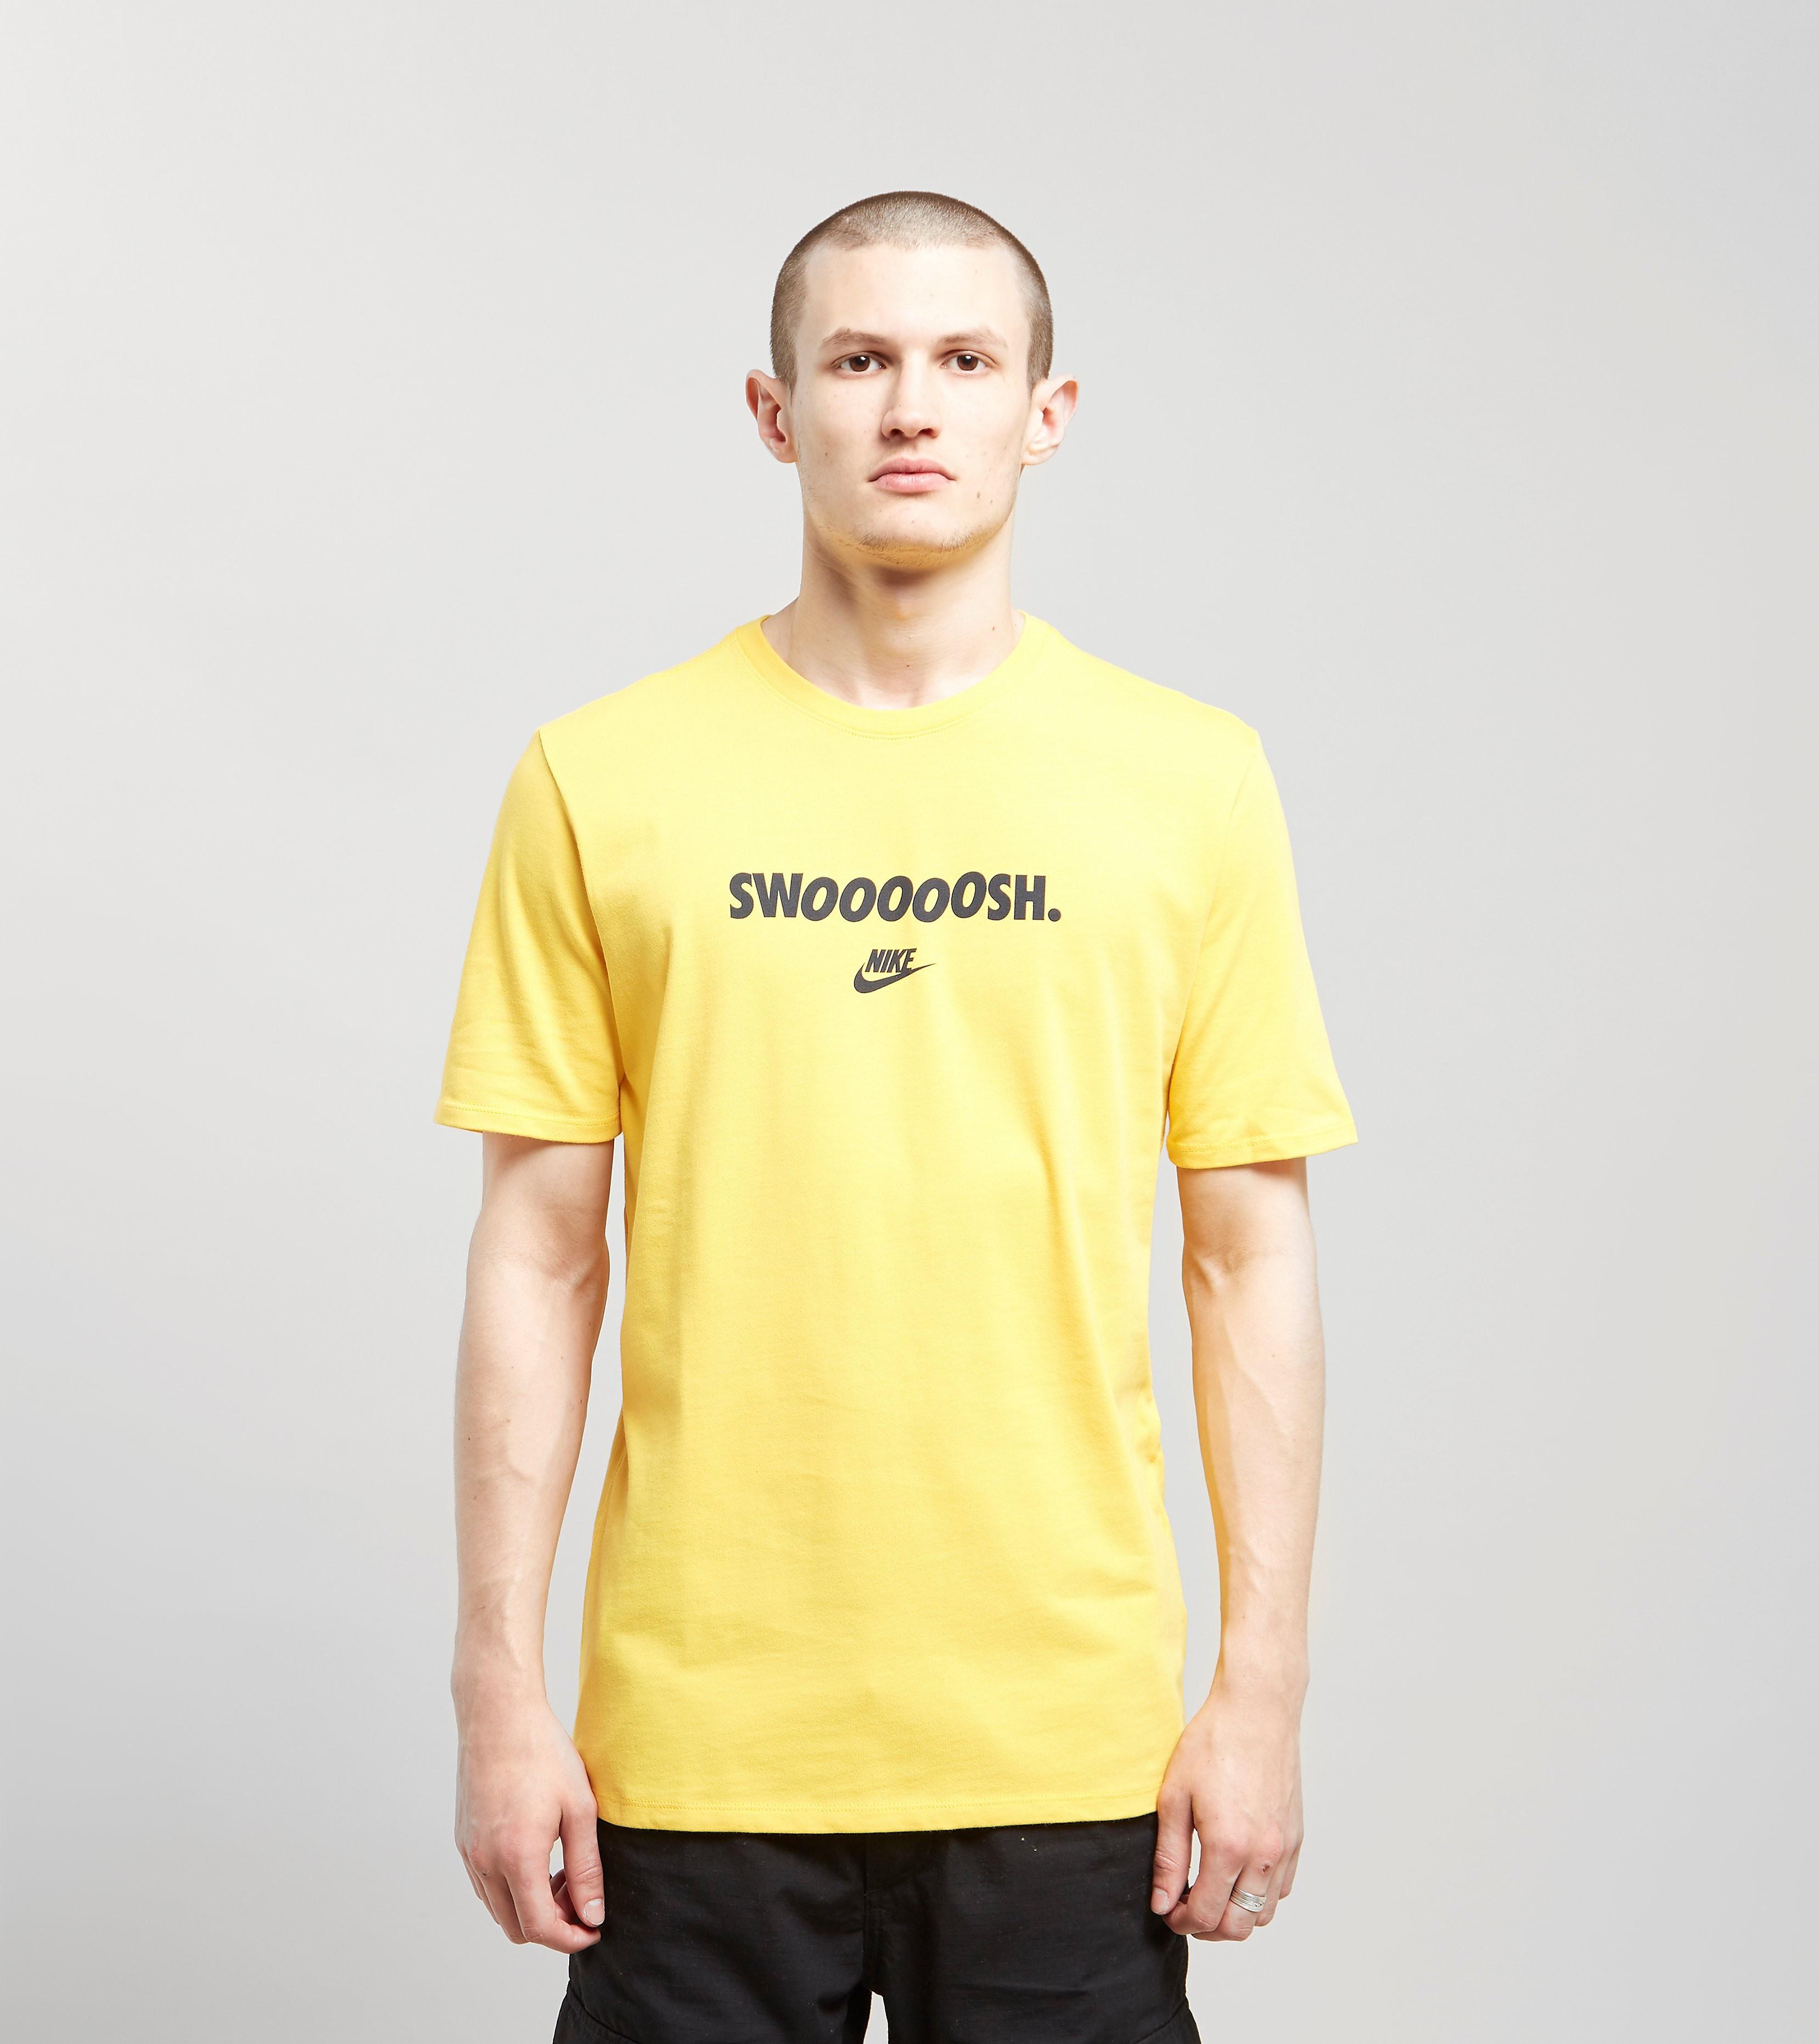 Nike Swooooosh T-Shirt